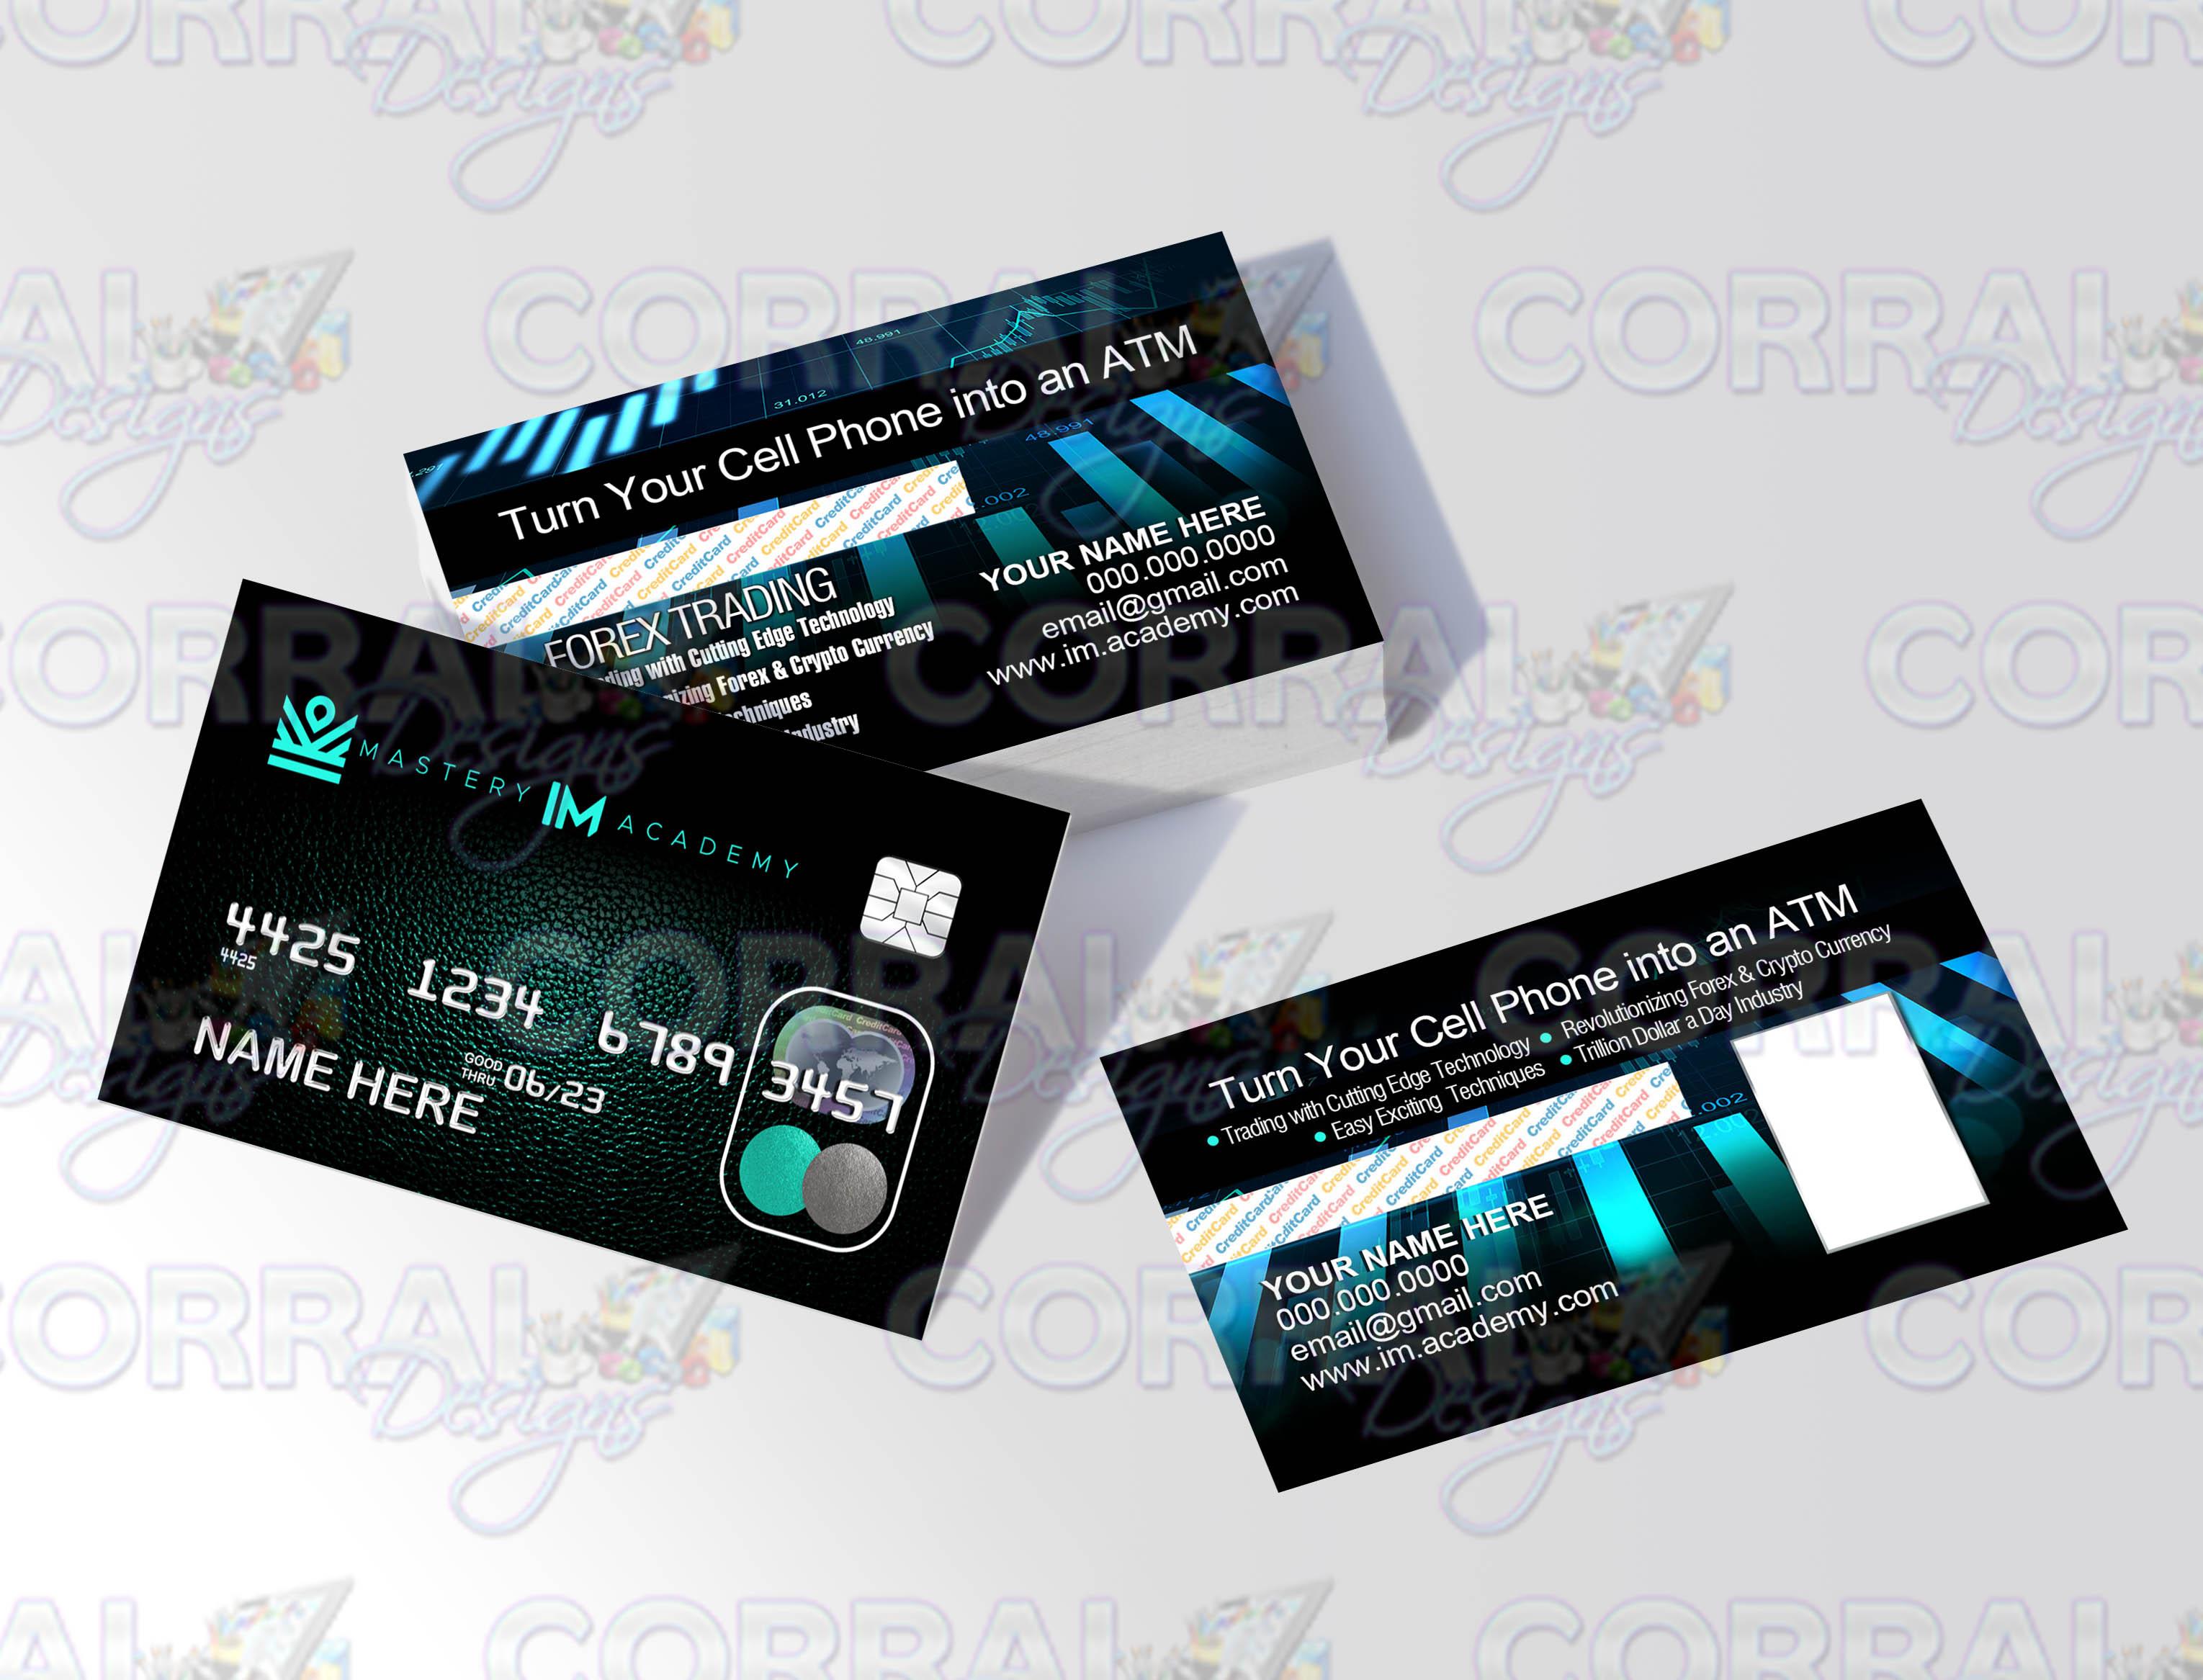 IM.academy Business Cards 101